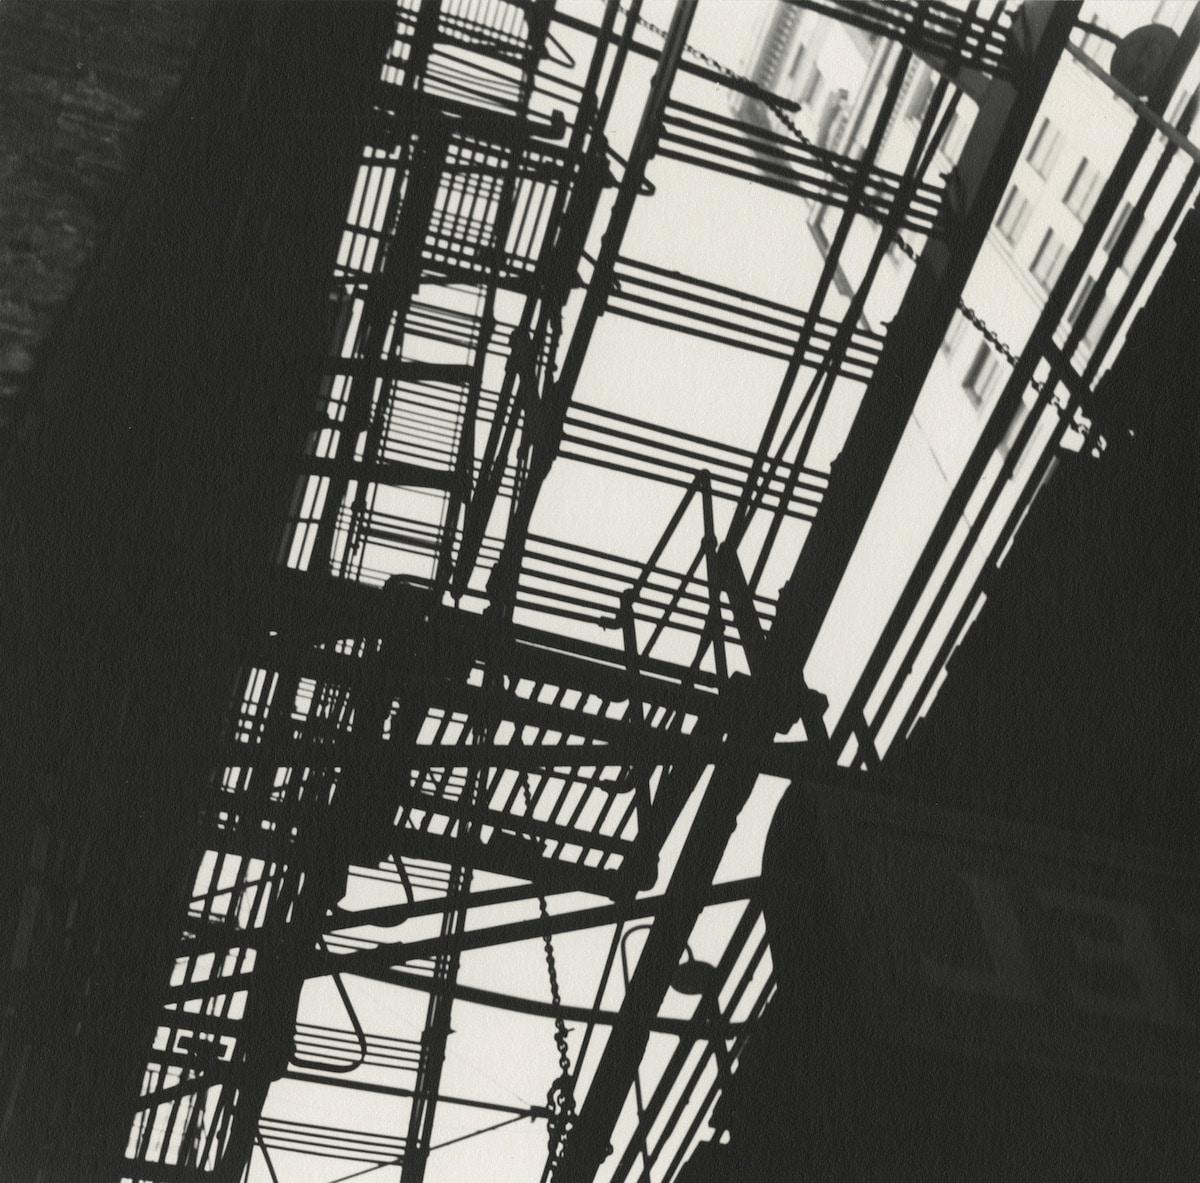 Ferenc Breko Photography